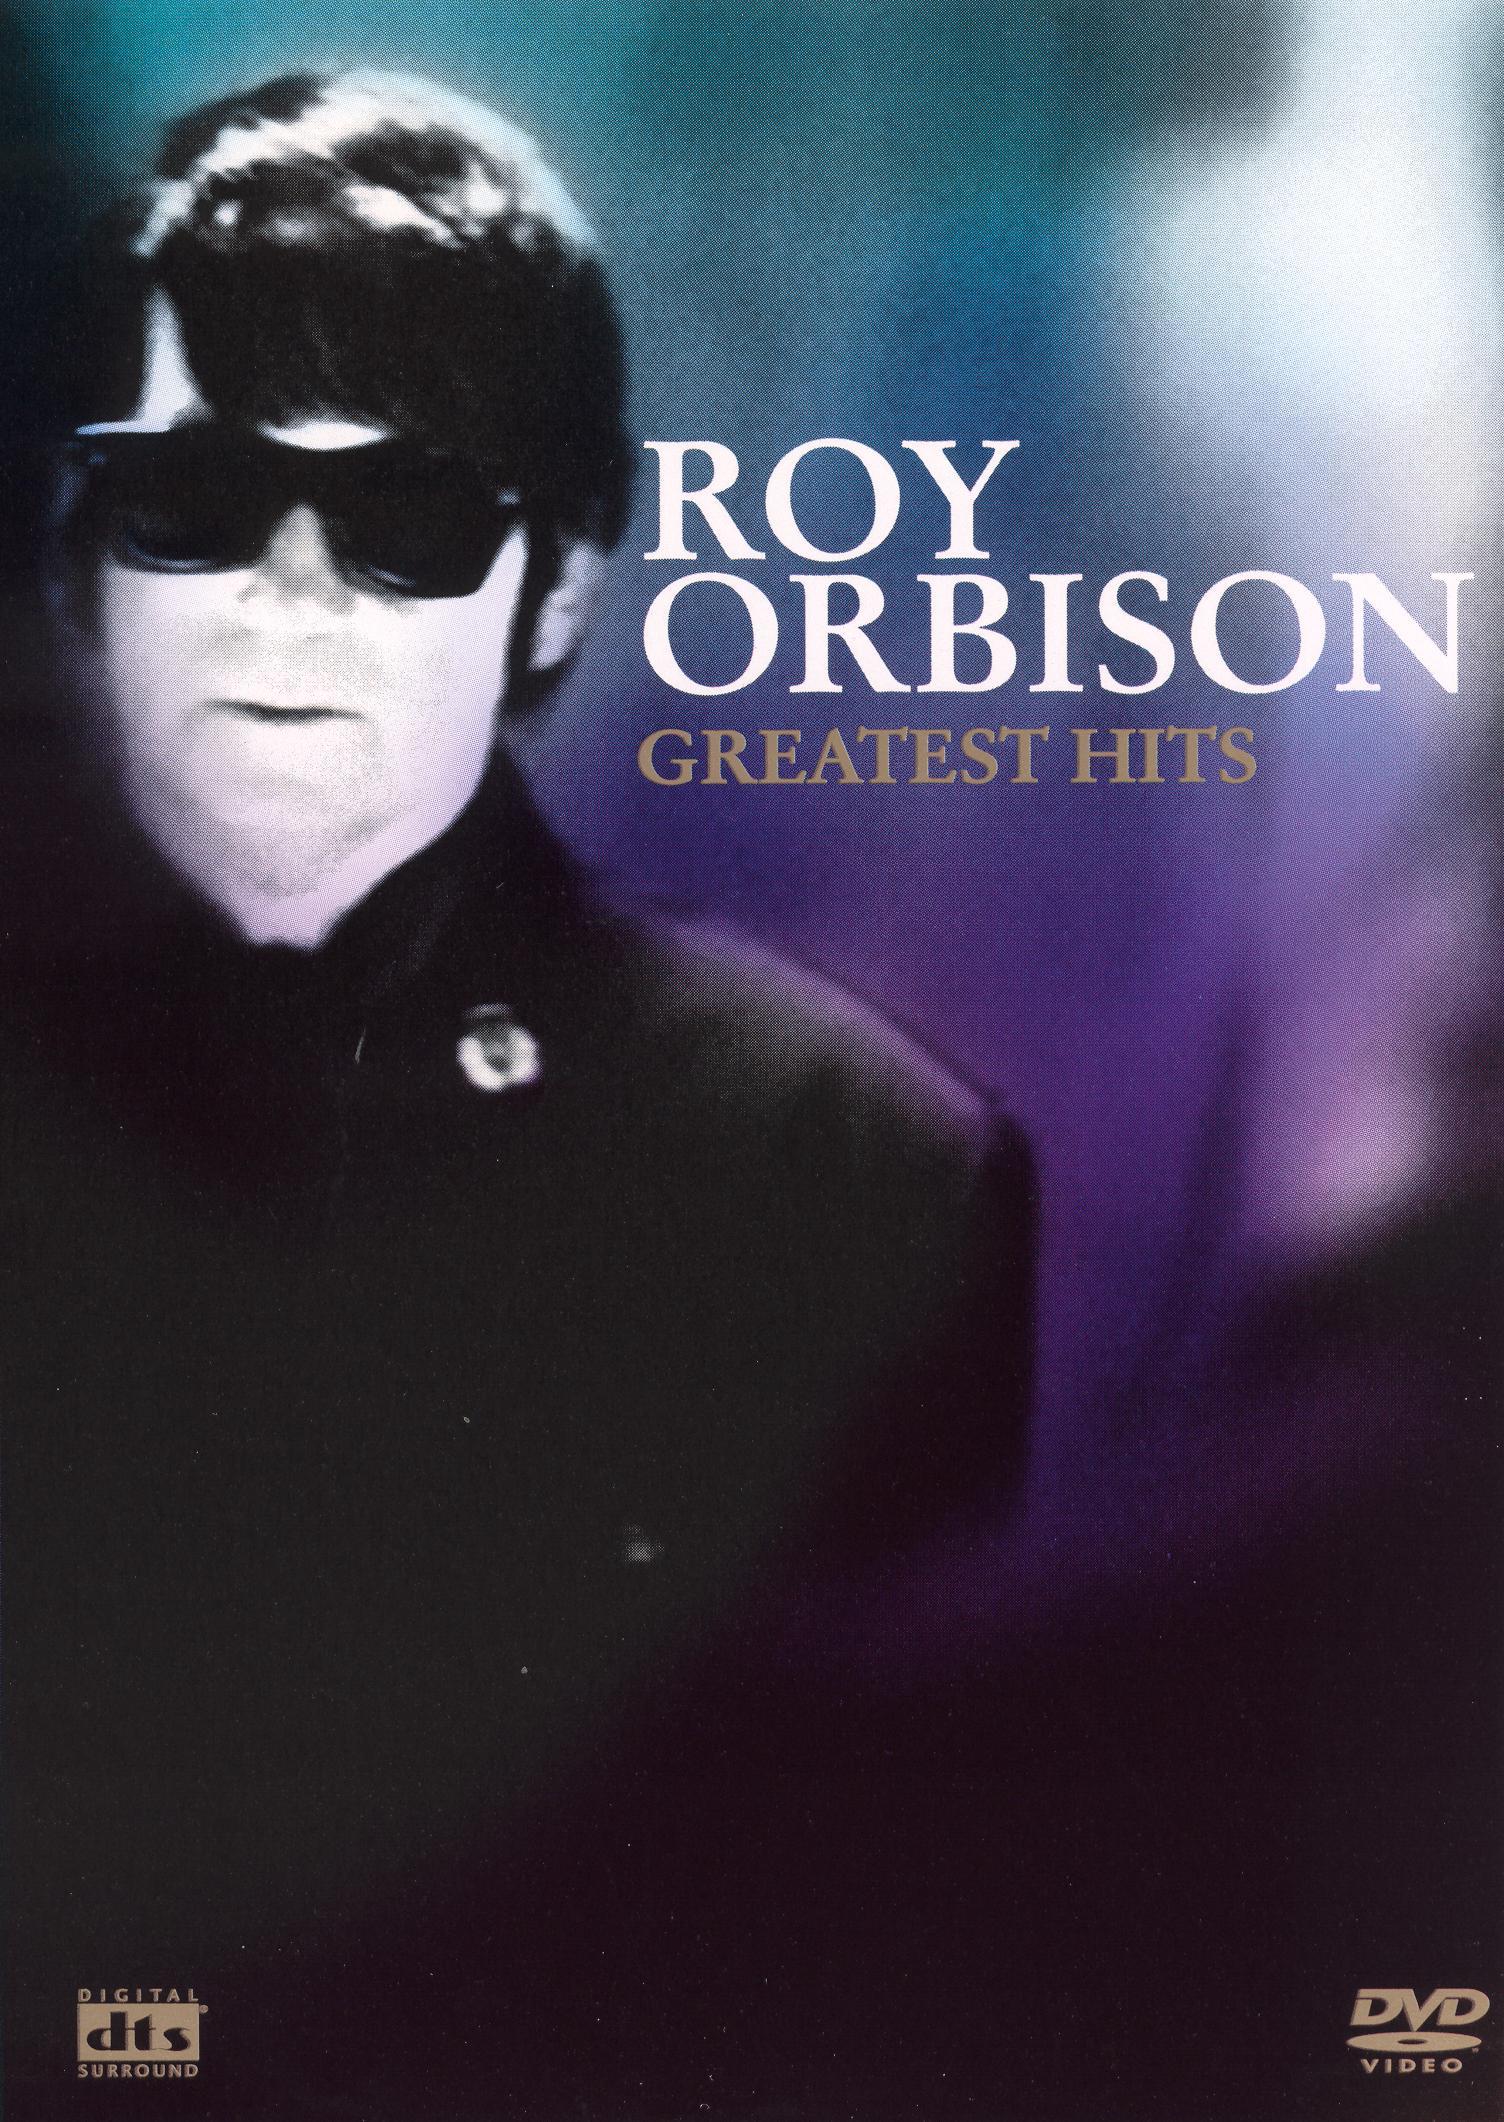 Roy Orbison: Greatest Hits